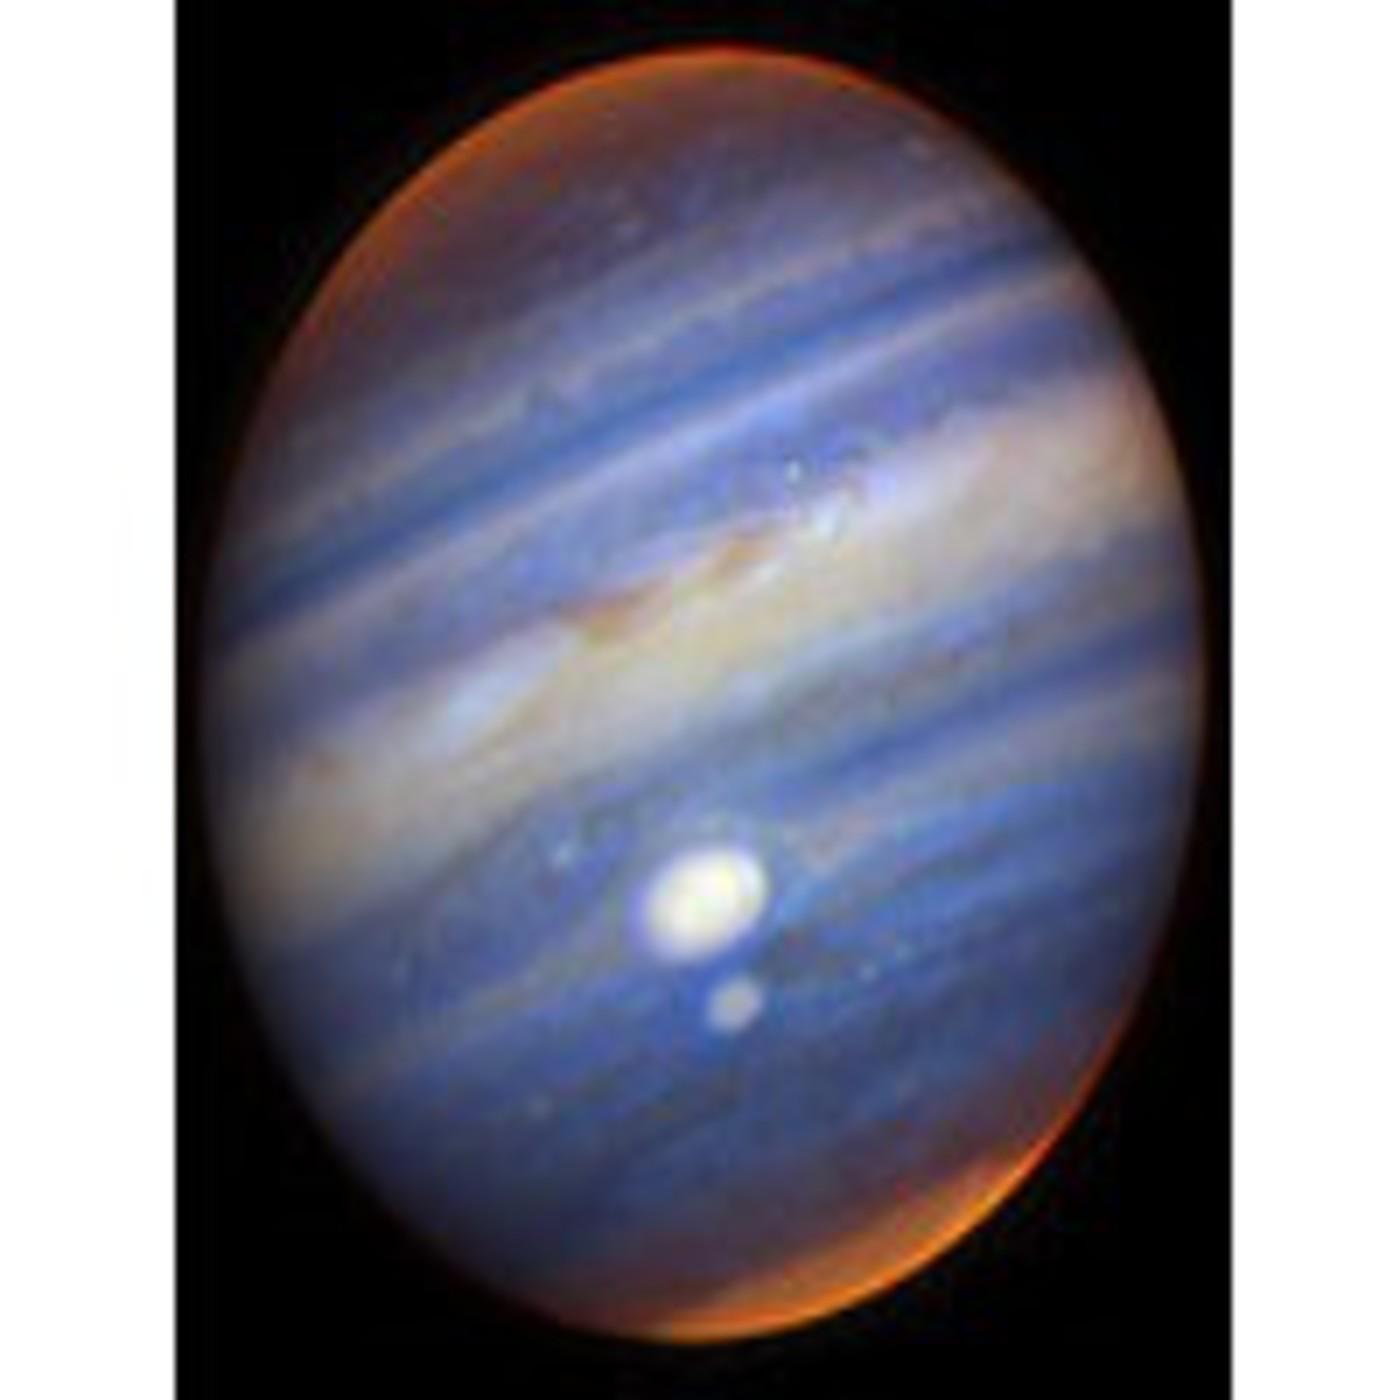 04_Júpiter,el planeta gigante